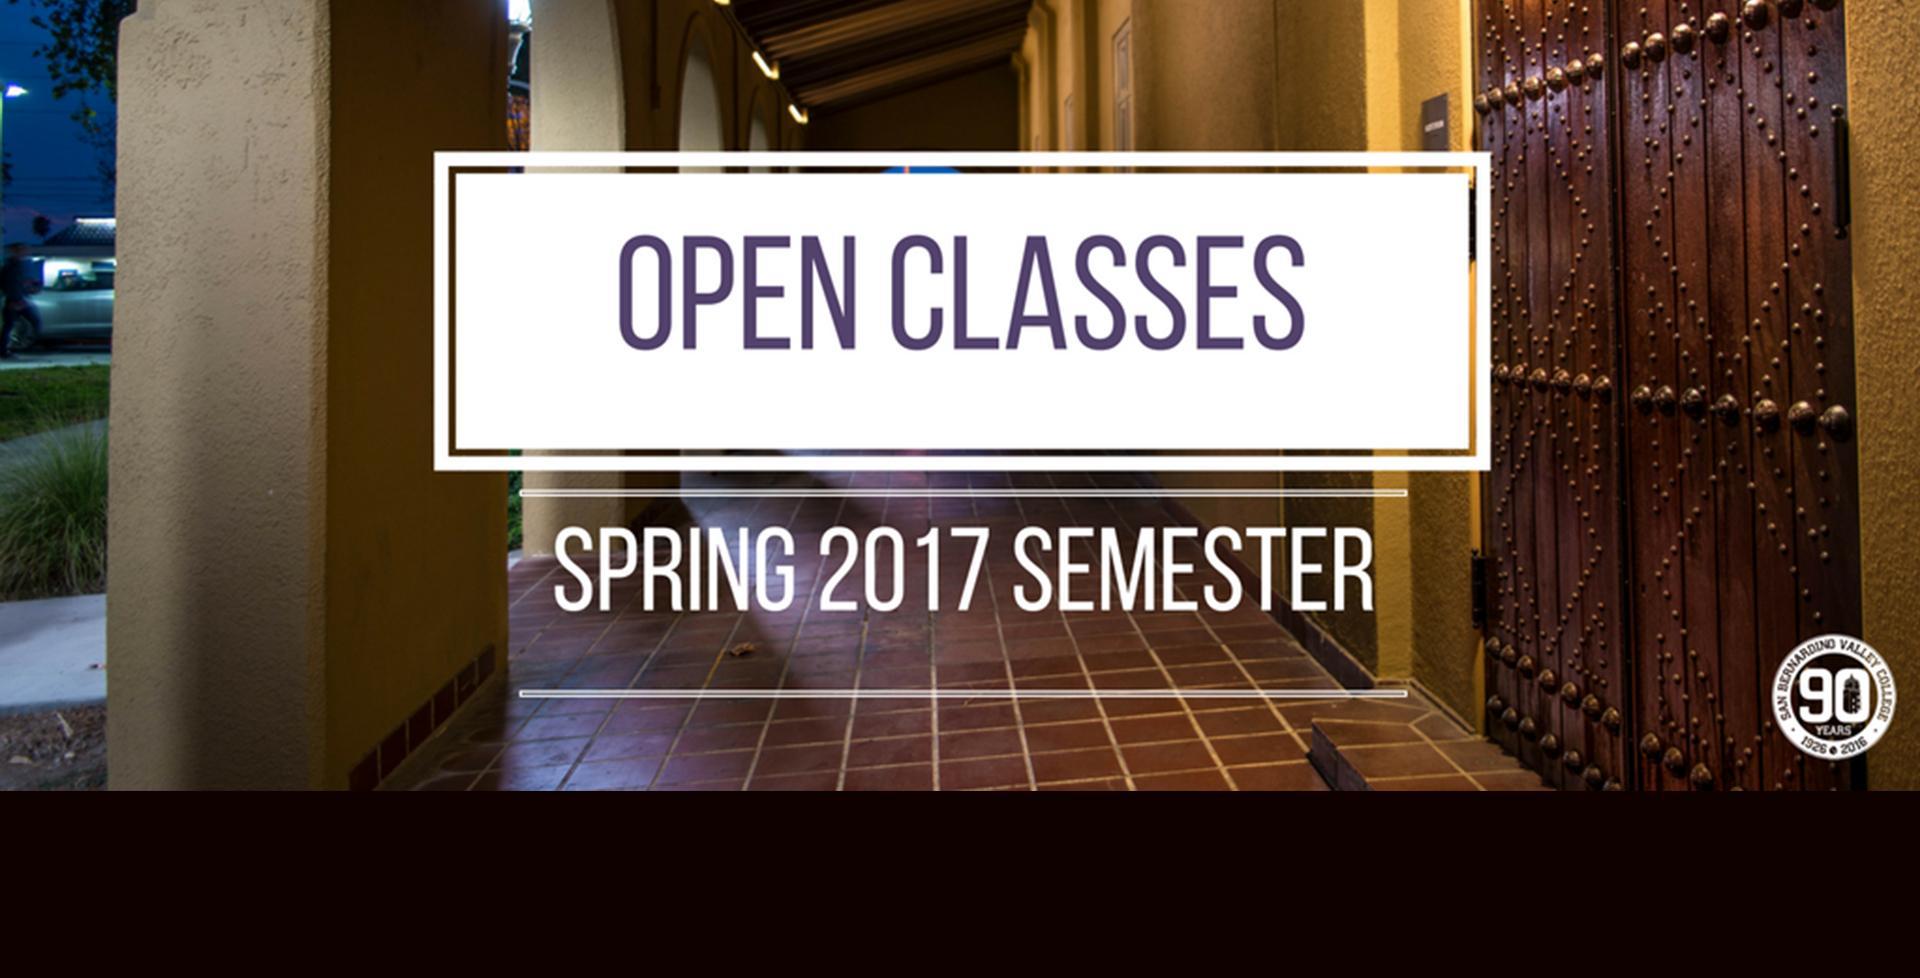 Spring '17 Open Classes >